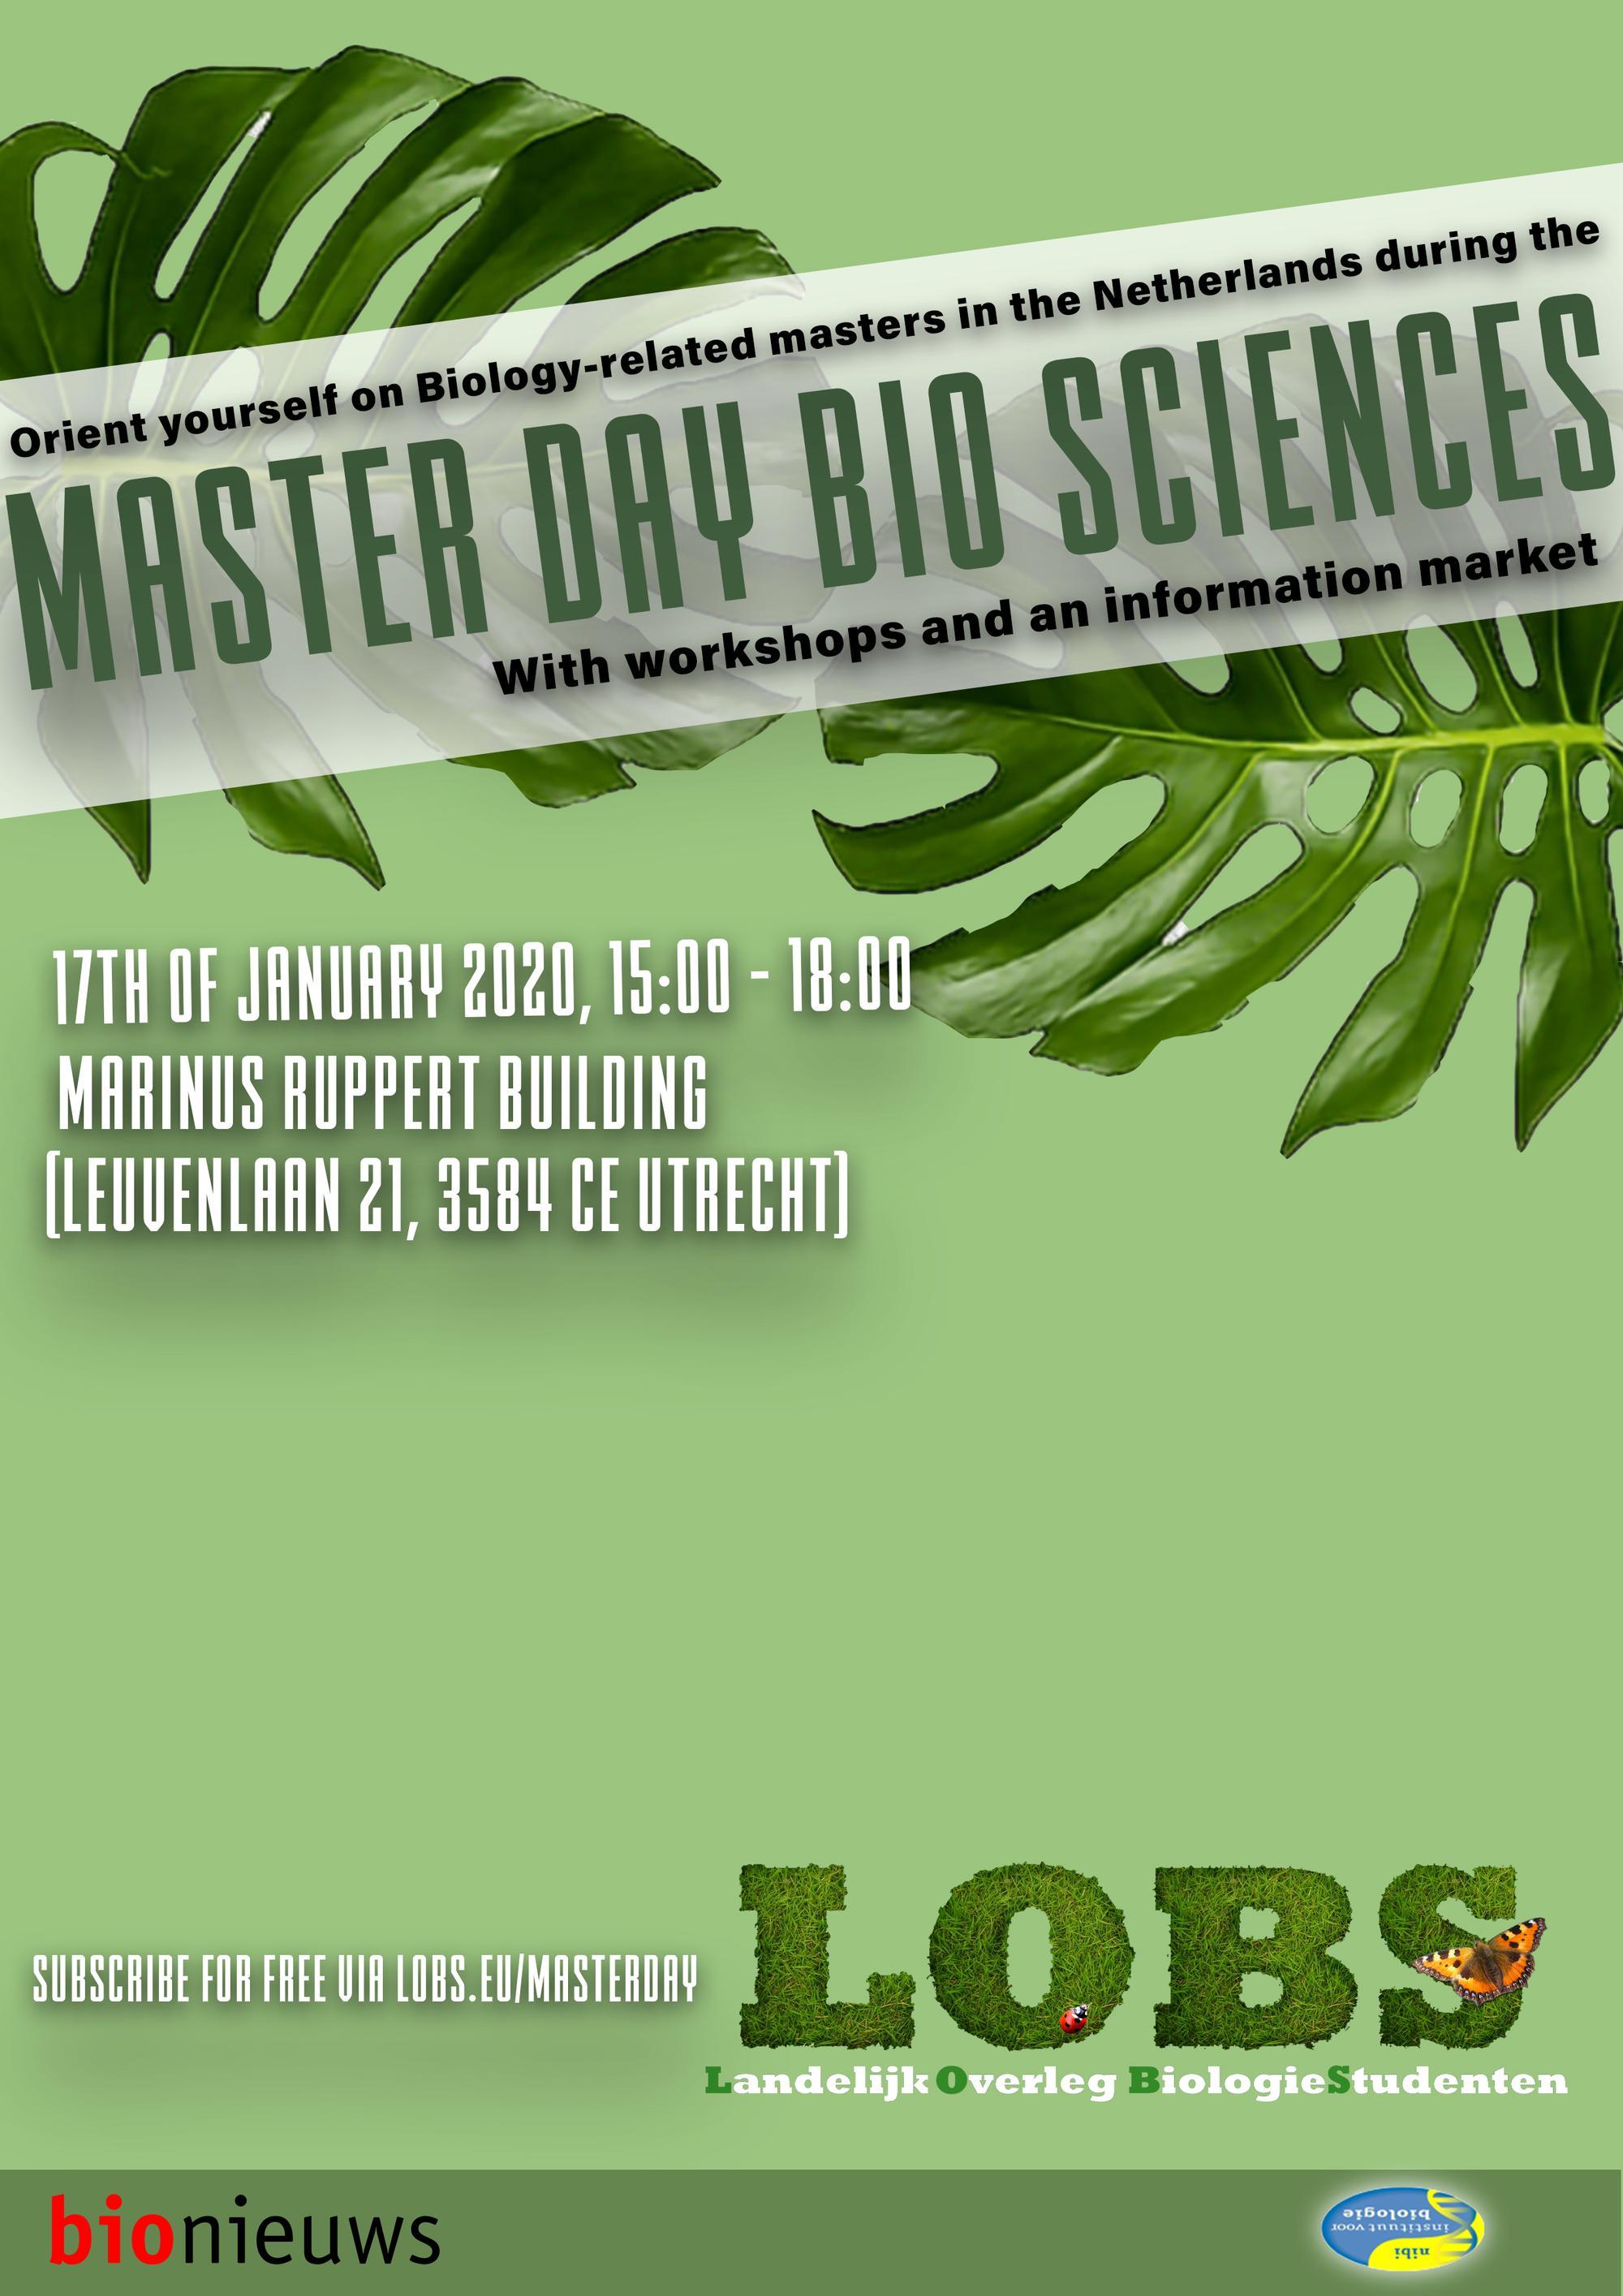 Master Day Bio-Sciences 2020